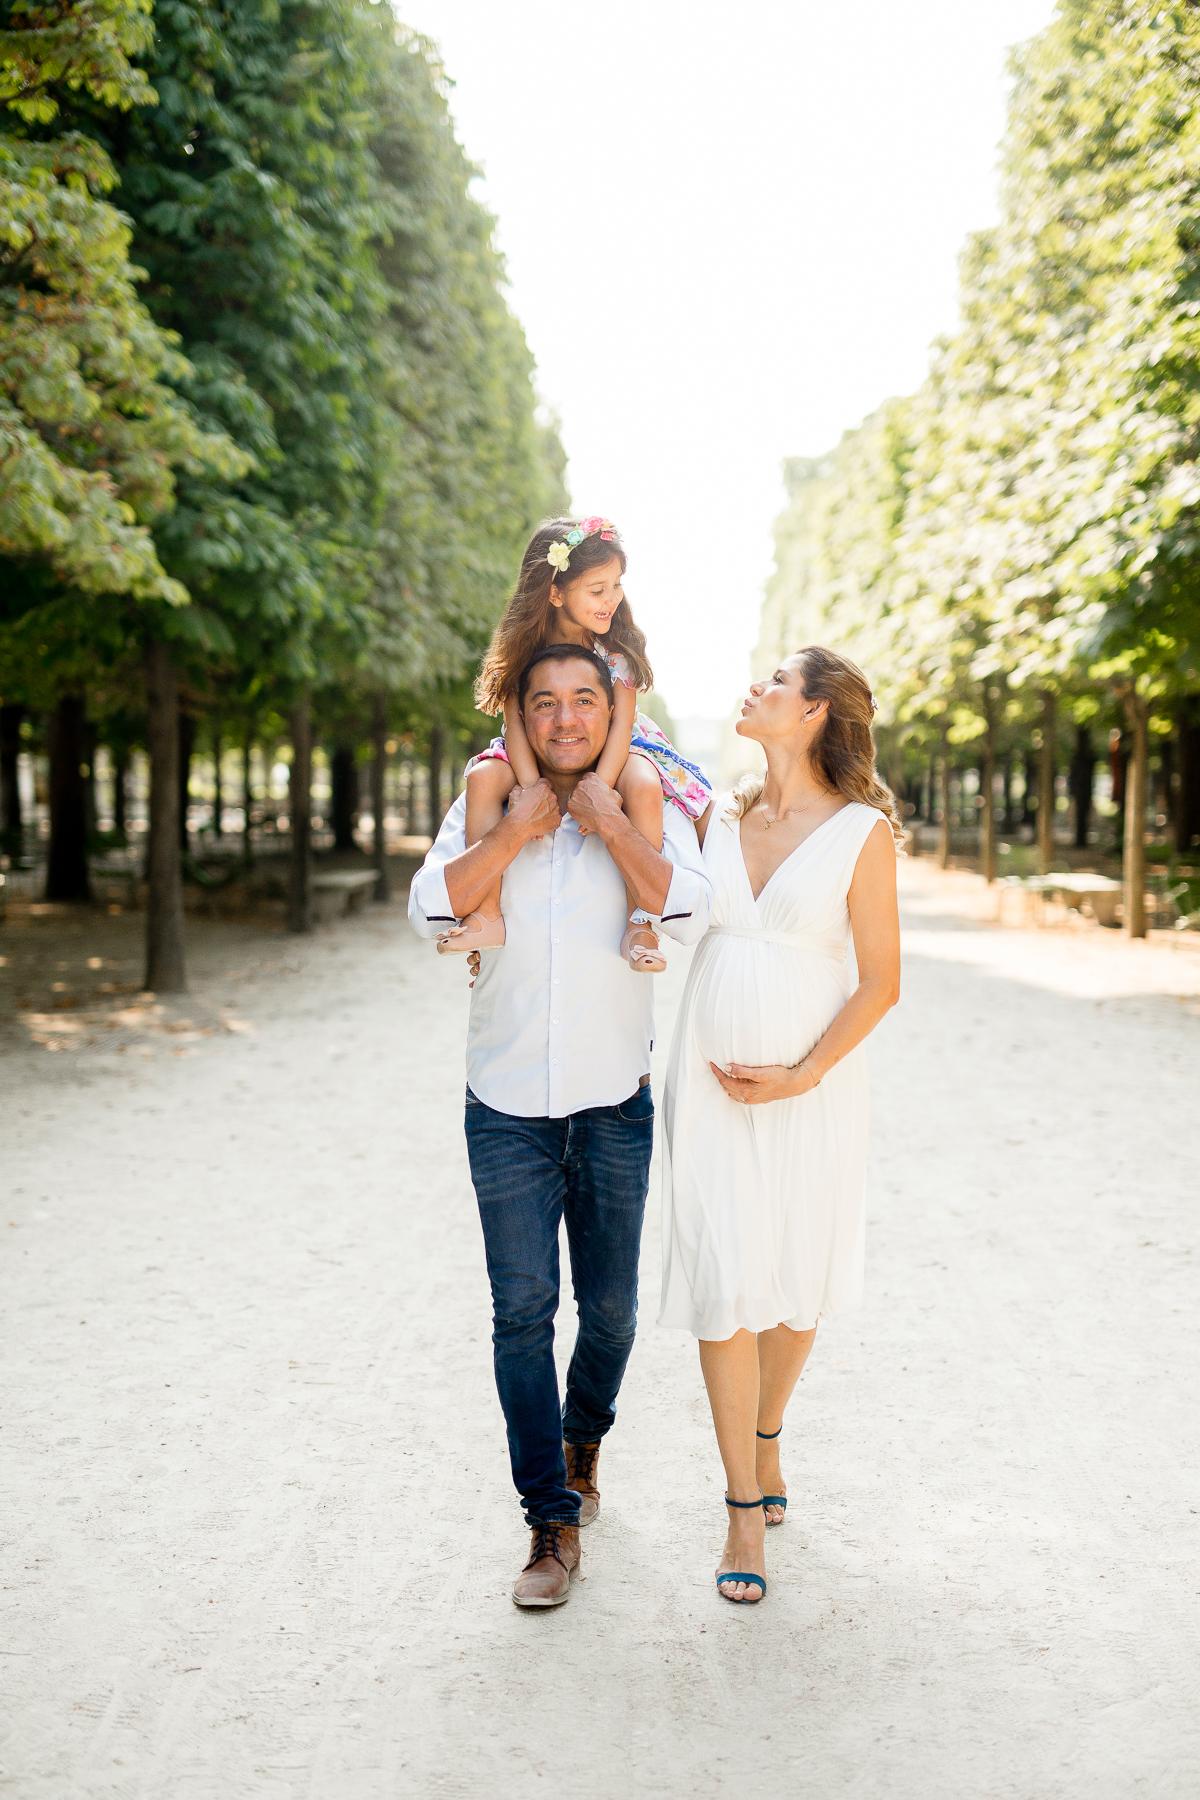 photographe_lifestyle_grosesse_famille_paris-louvre_001.jpg